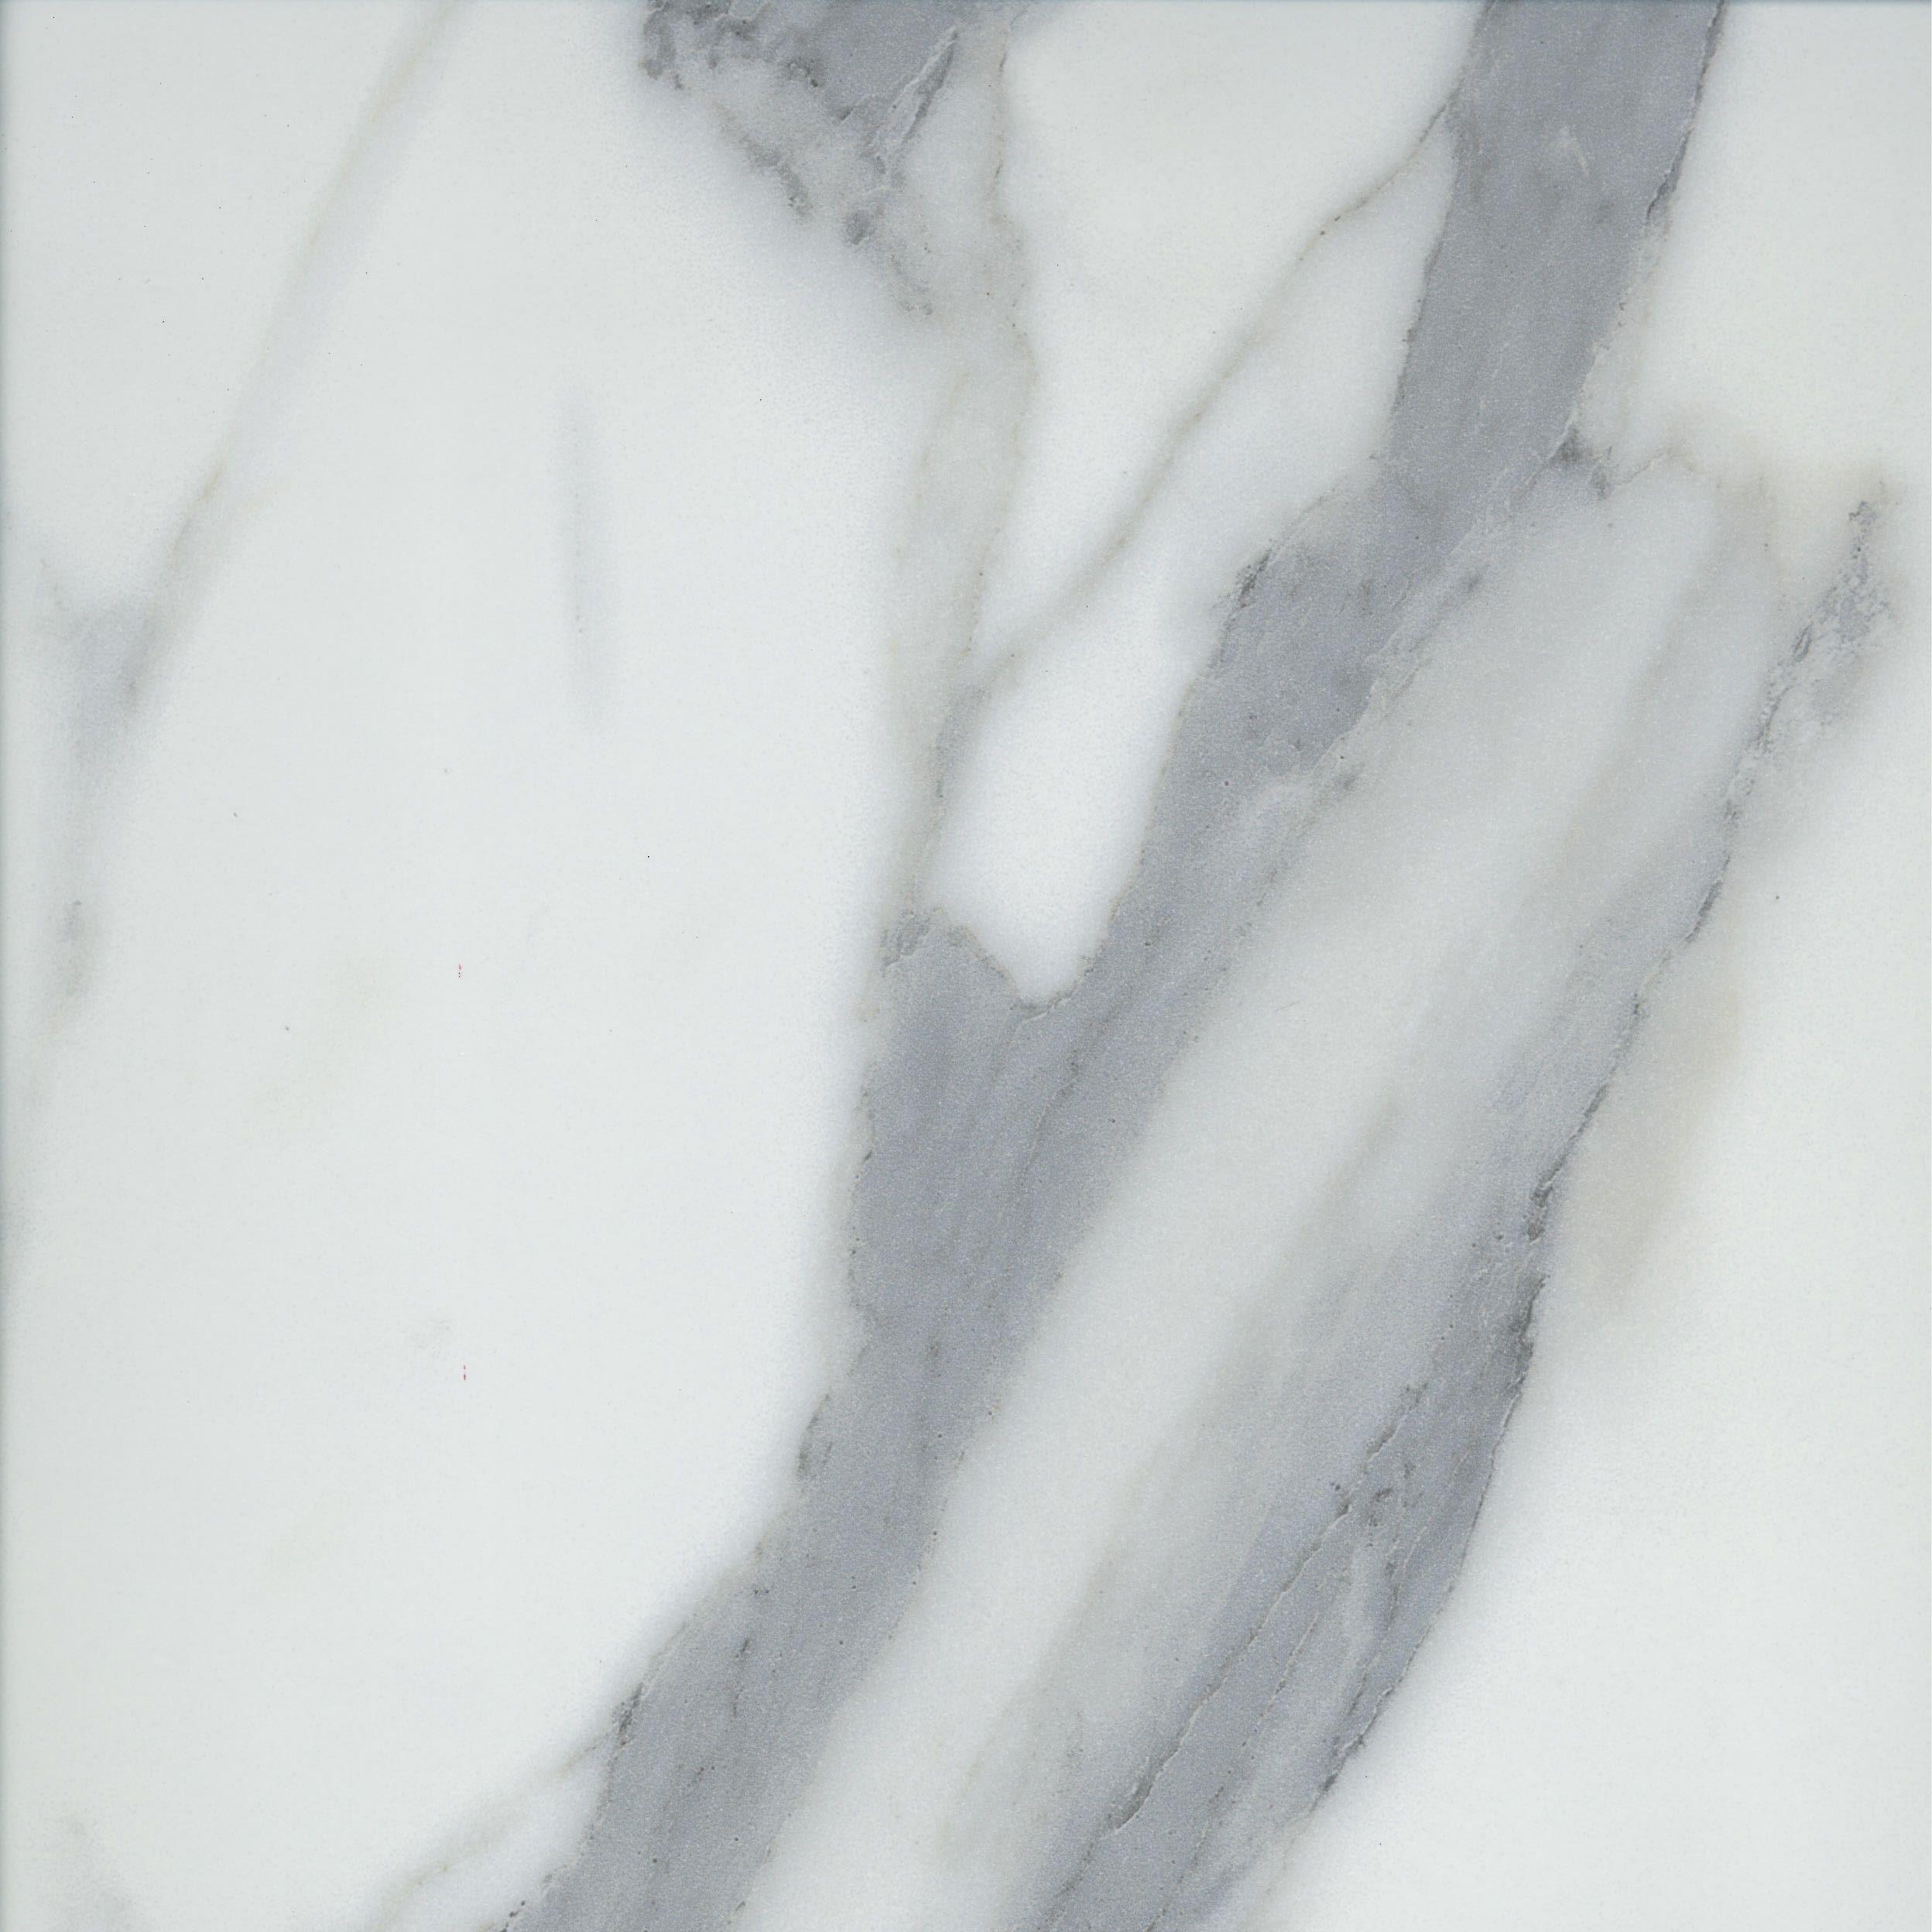 Bathroom worktops b q - Marble Veneto Soft White Stone Effect Worktop Edging Tape L 3m Departments Diy At B Q